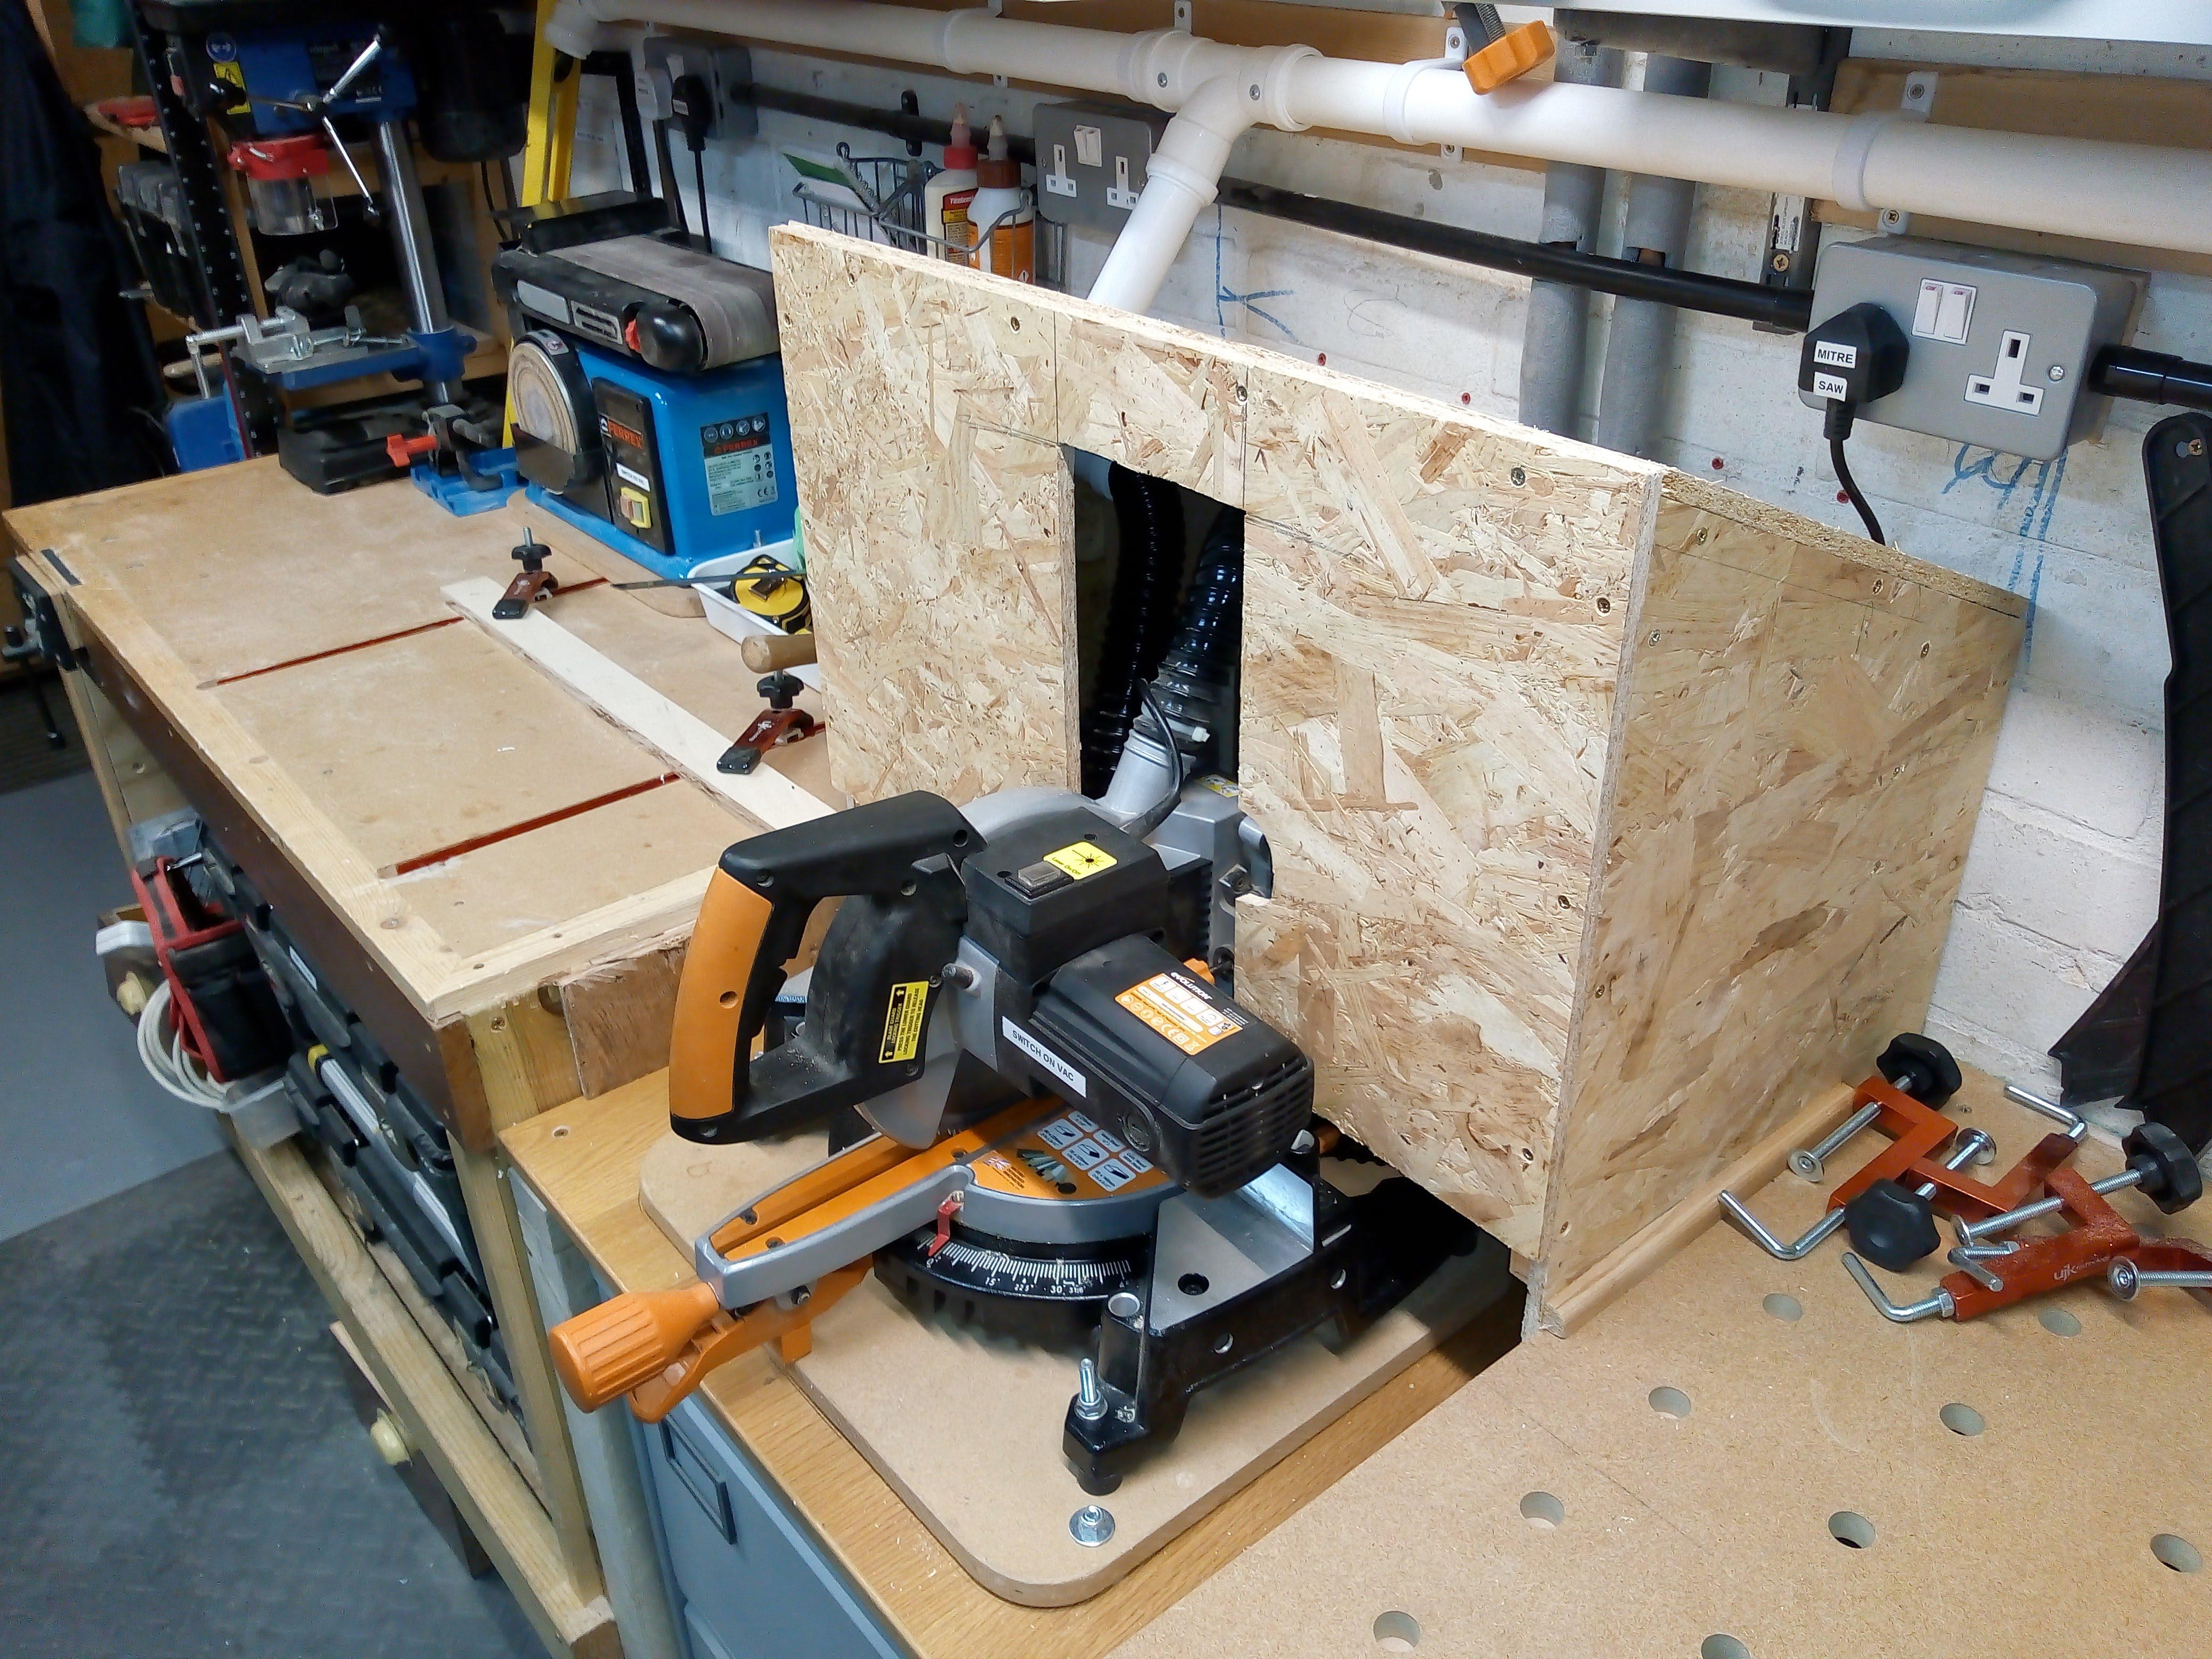 mitre-saw-hood-3jul20.jpg